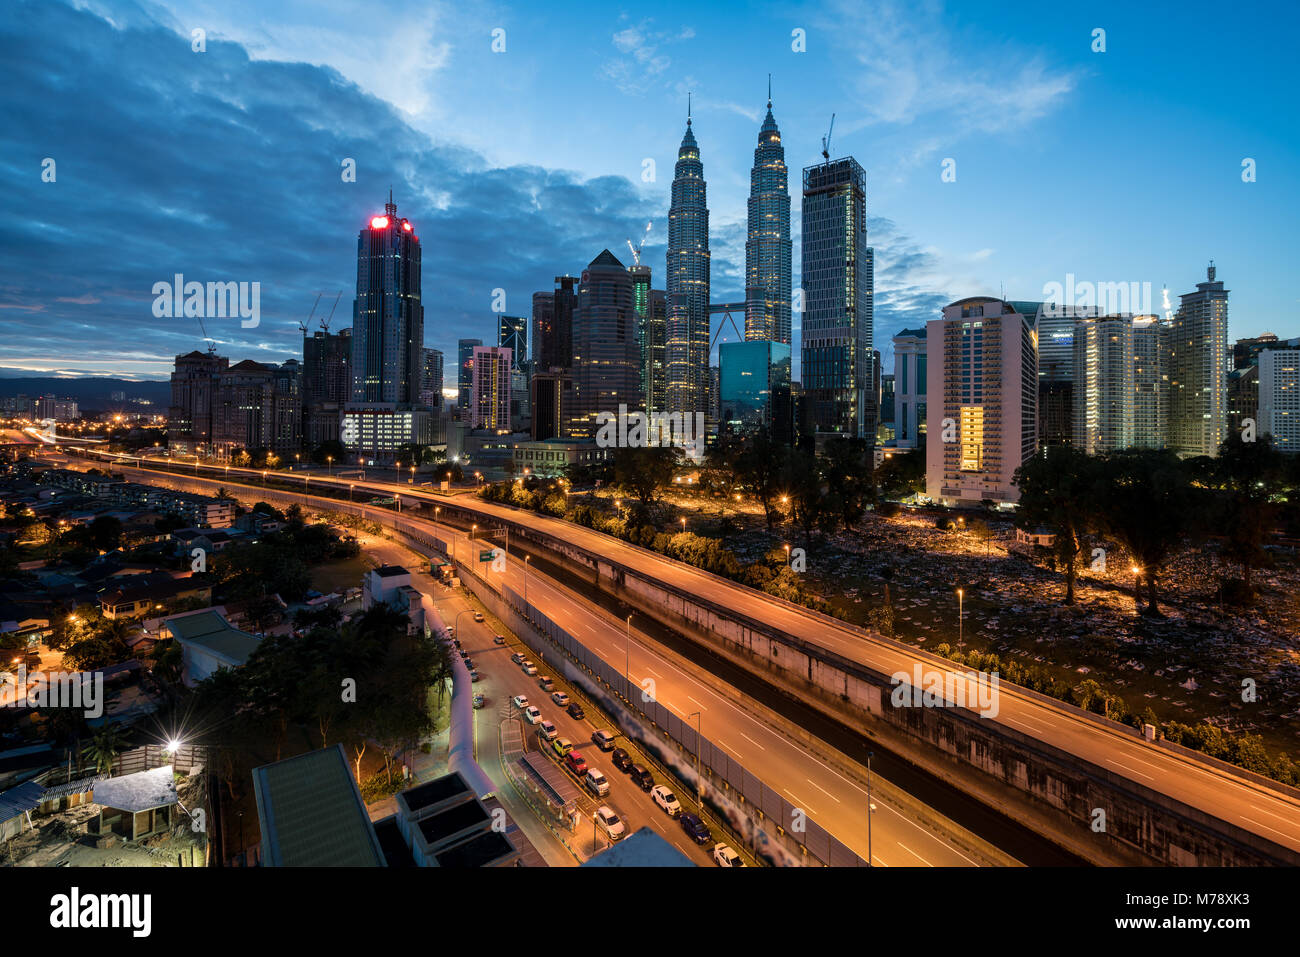 Kuala Lumpur skyline and skyscraper with highway road at night in Kuala Lumpur, Malaysia. Asia. - Stock Image